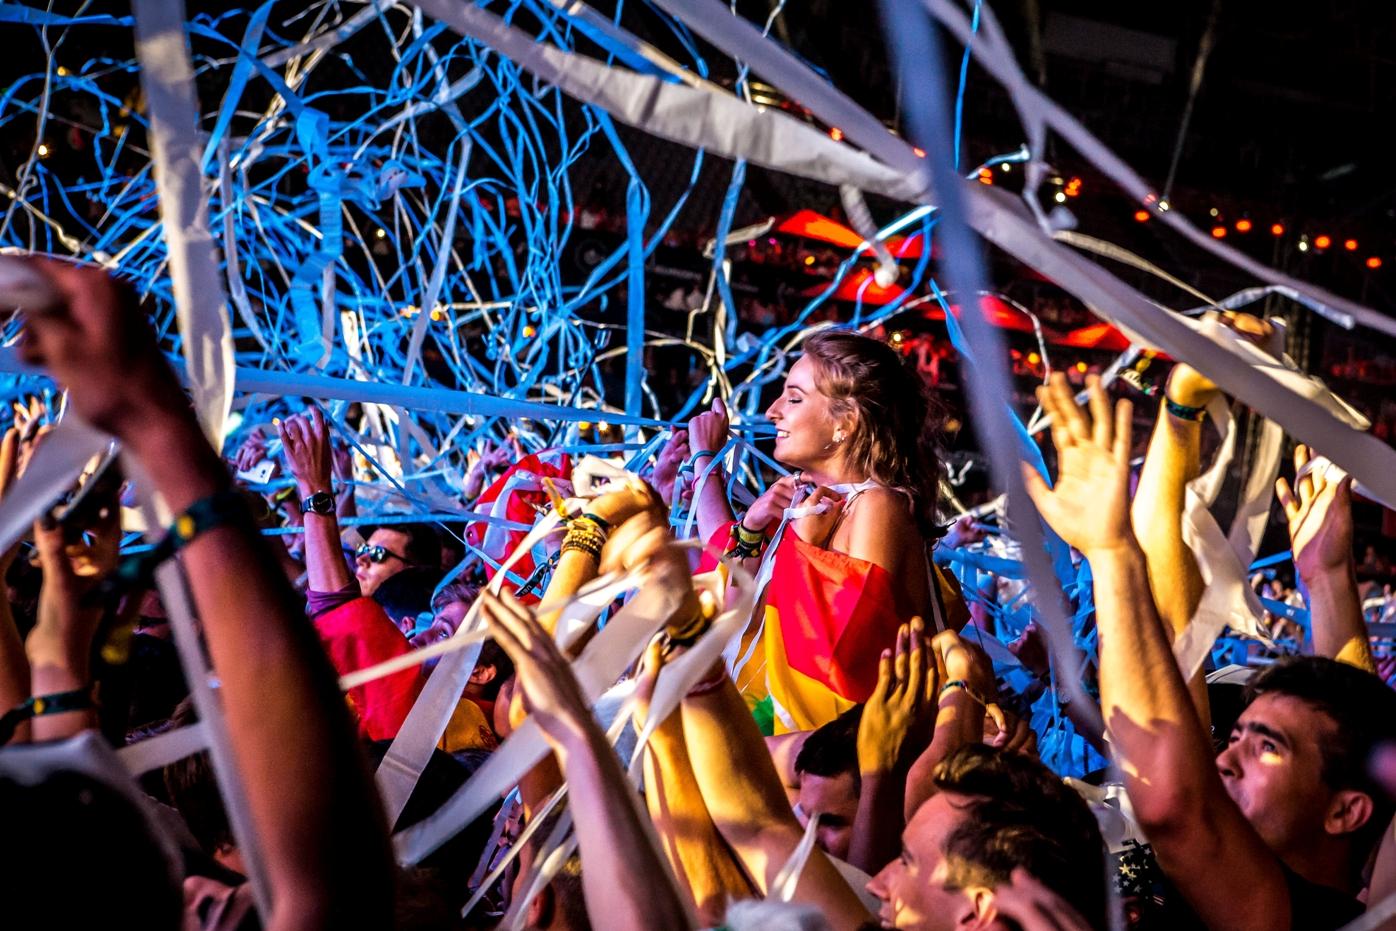 CROATIA WINTER MUSIC FESTIVAL